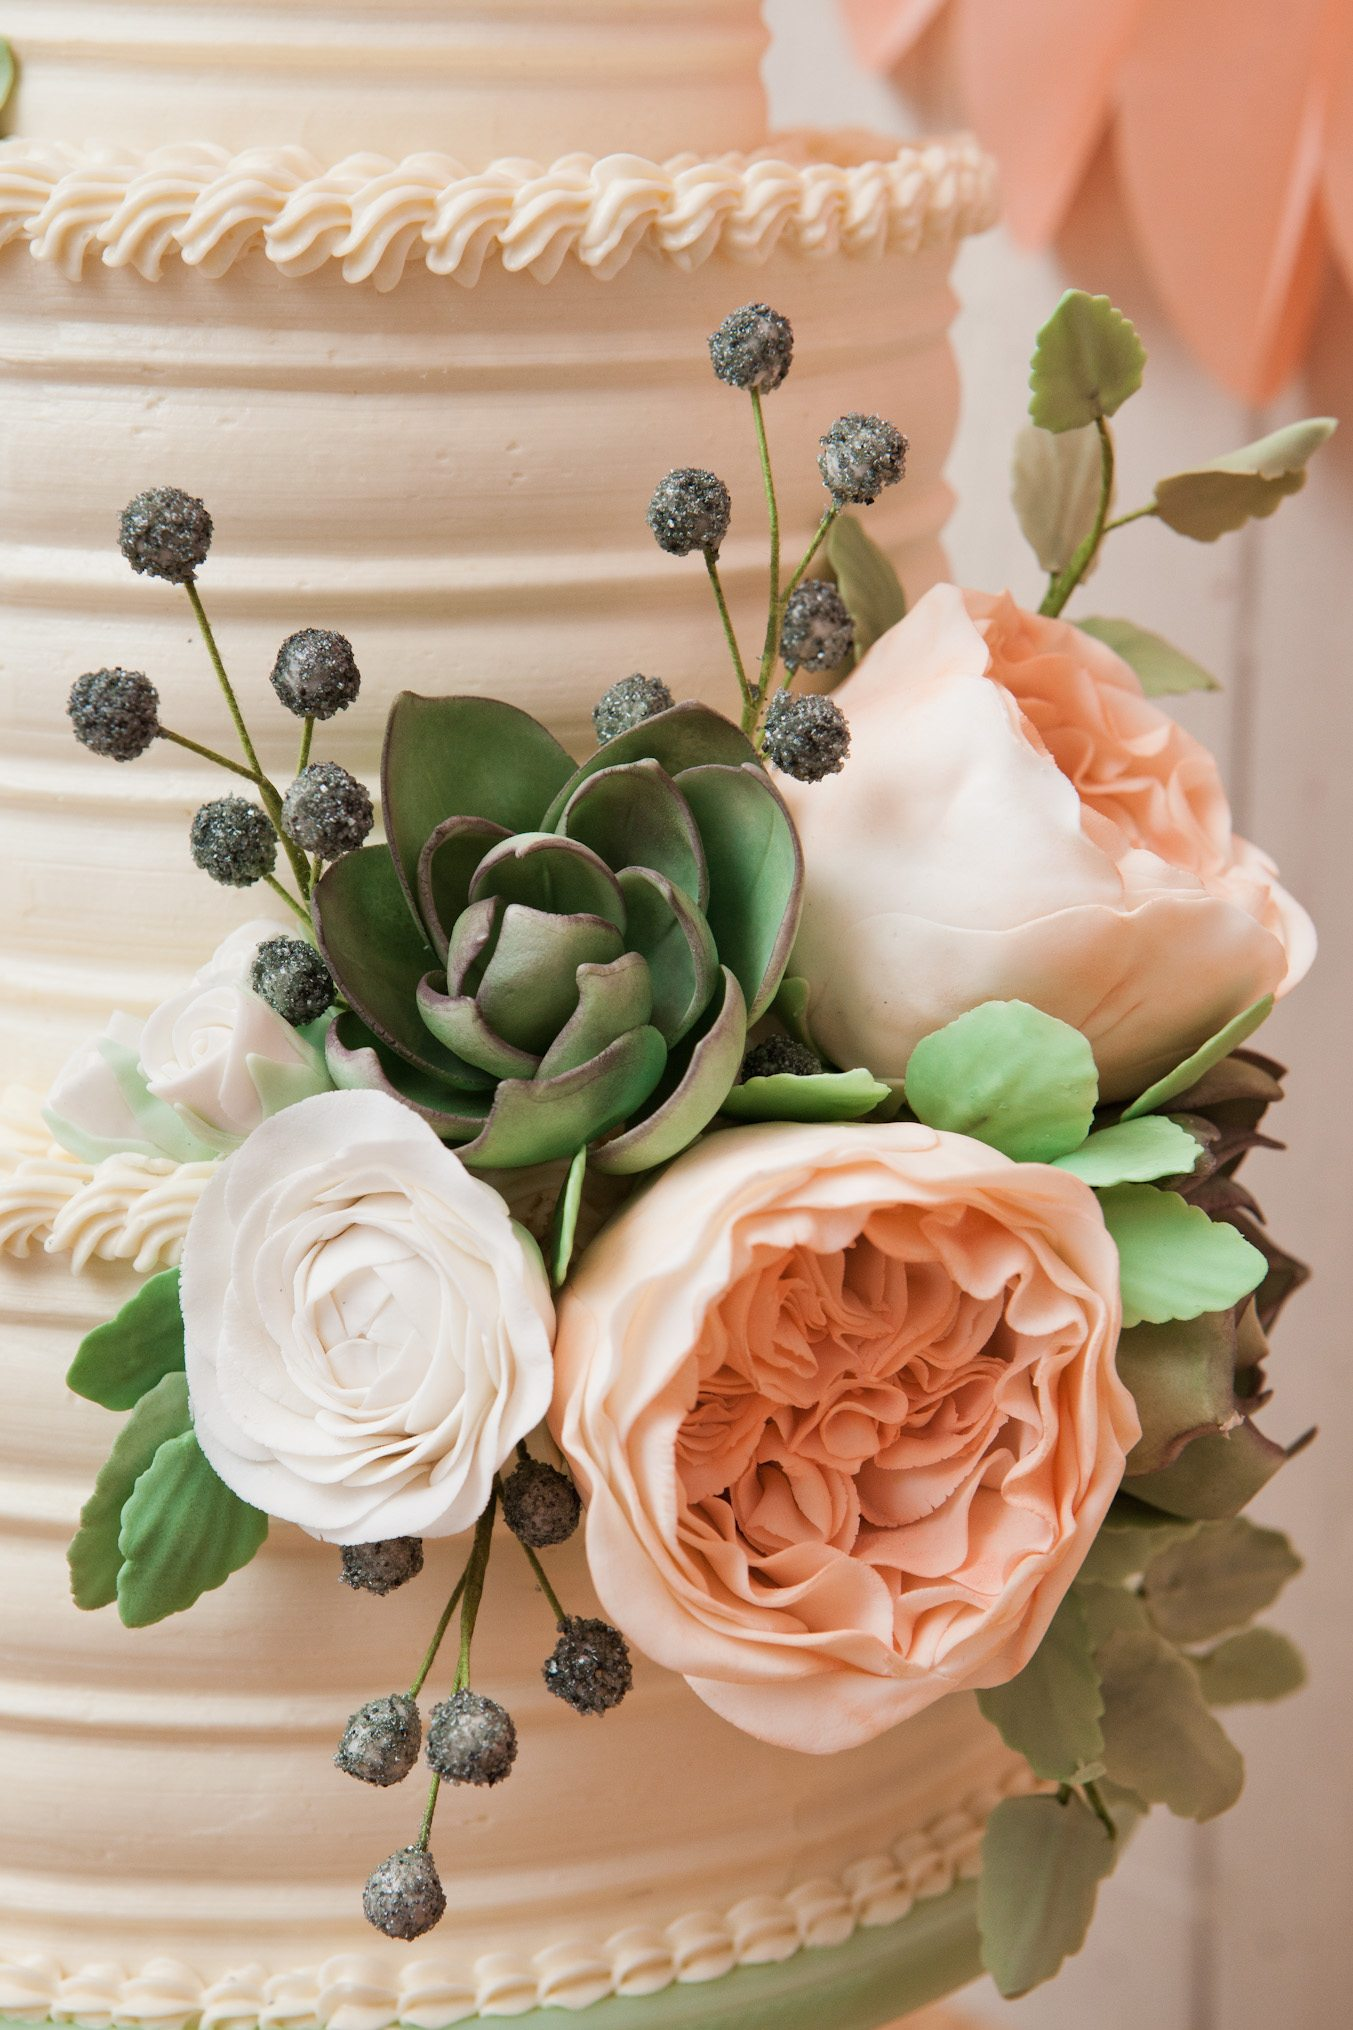 Peonyweddingcake The Sweetest Occasion - Peony Wedding Cake